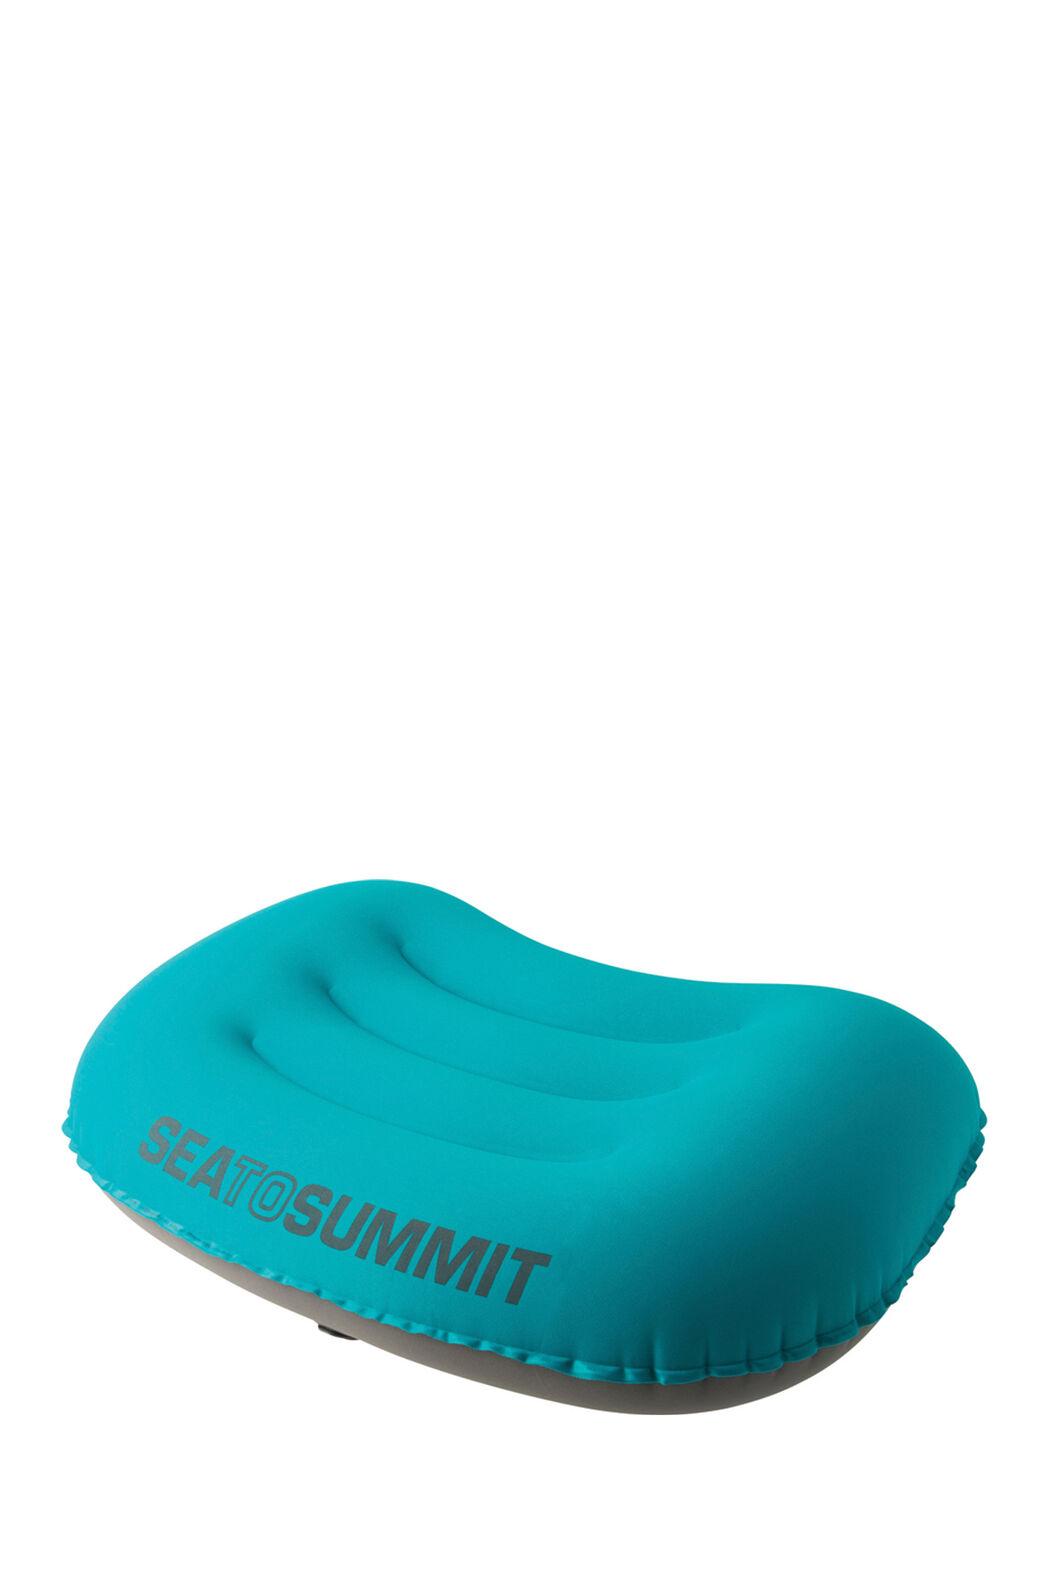 Sea to Summit Aeros Ultralight Pillow Teal, None, hi-res